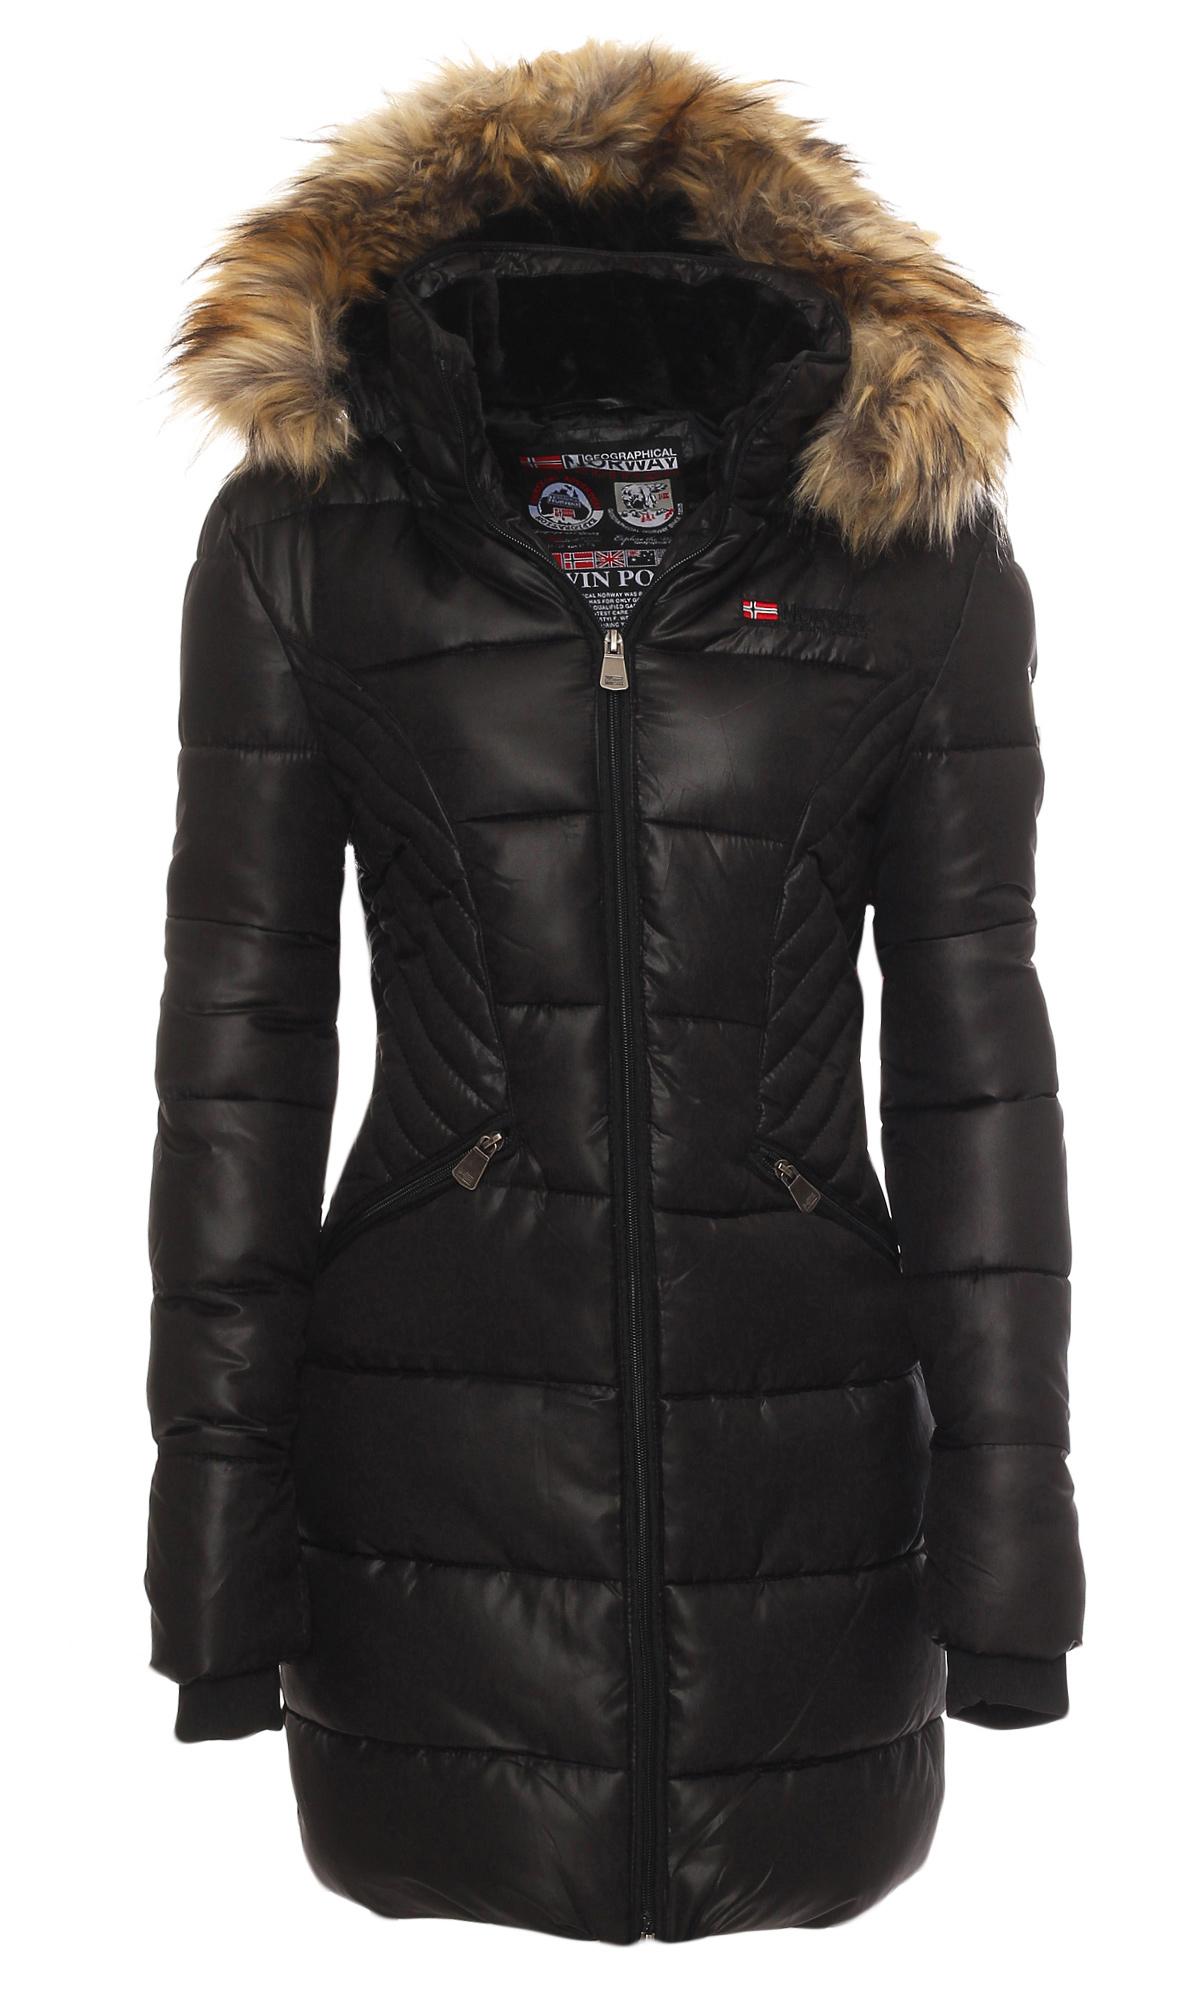 geographical norway ladies winter jacket parka long coat. Black Bedroom Furniture Sets. Home Design Ideas